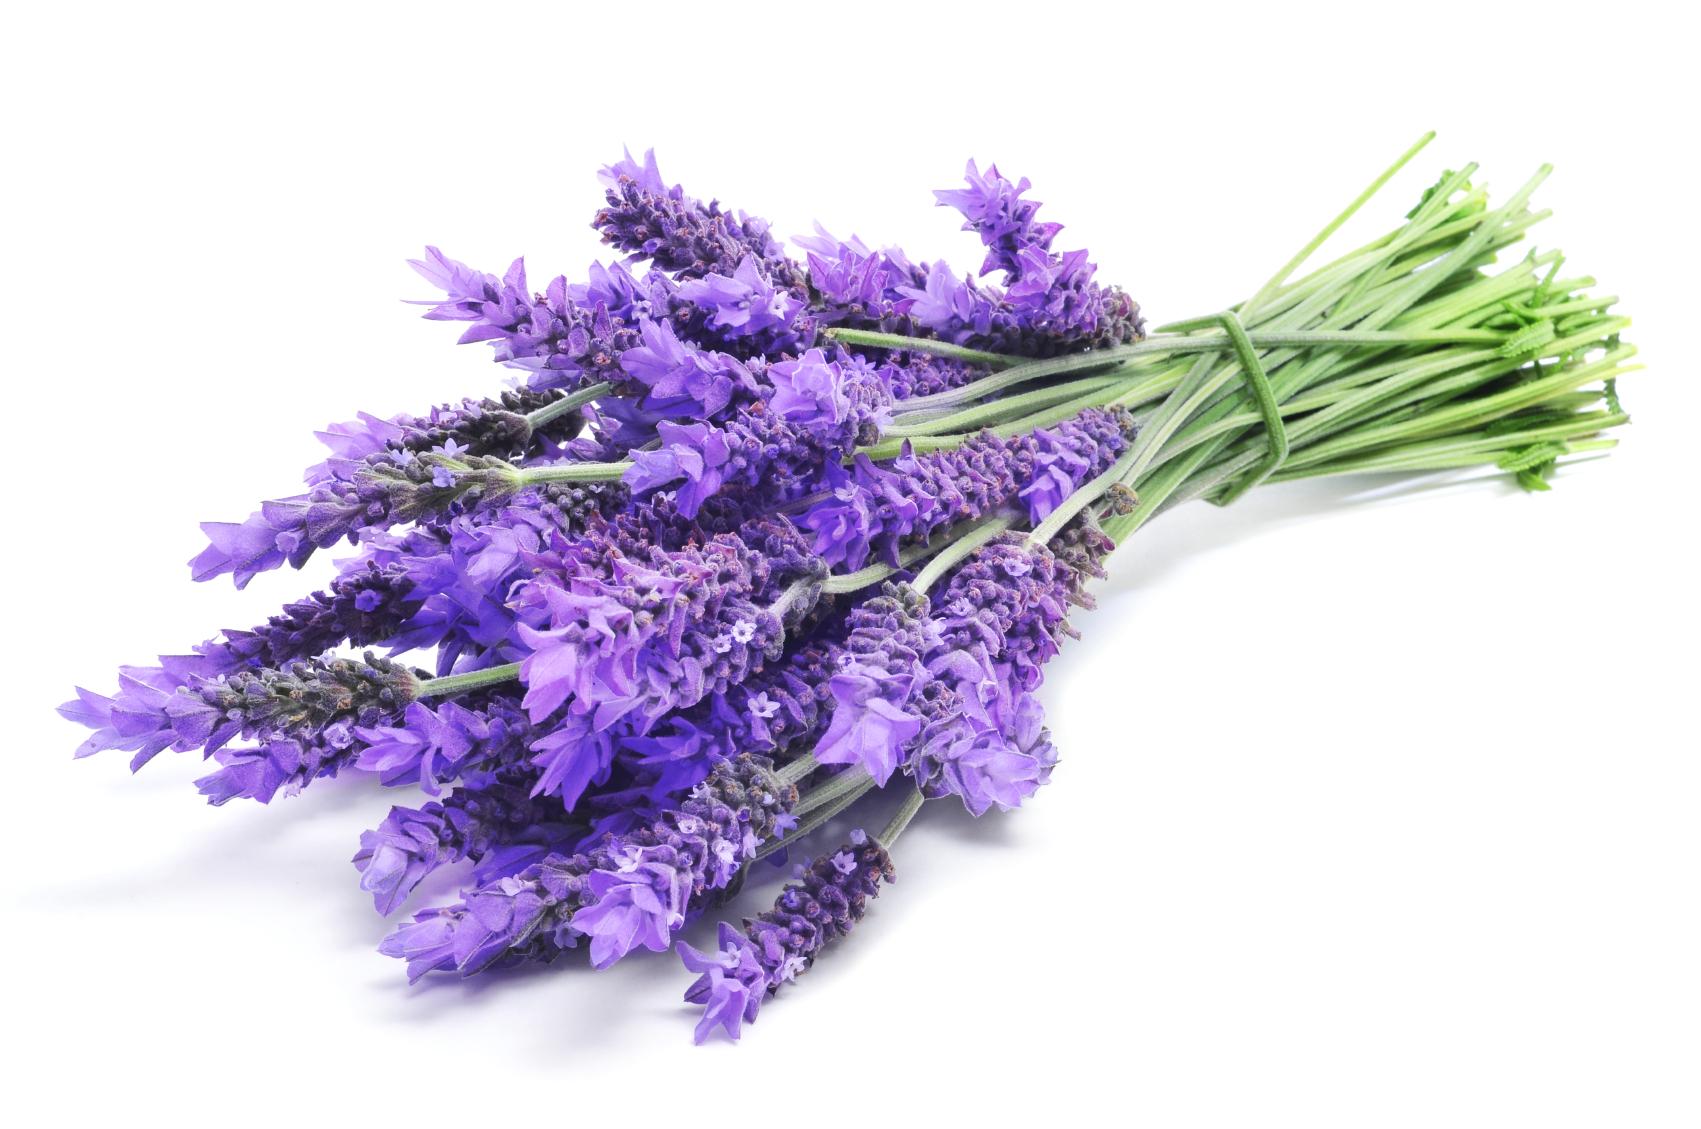 Lavandula Angustifolia (Lavender) Oil